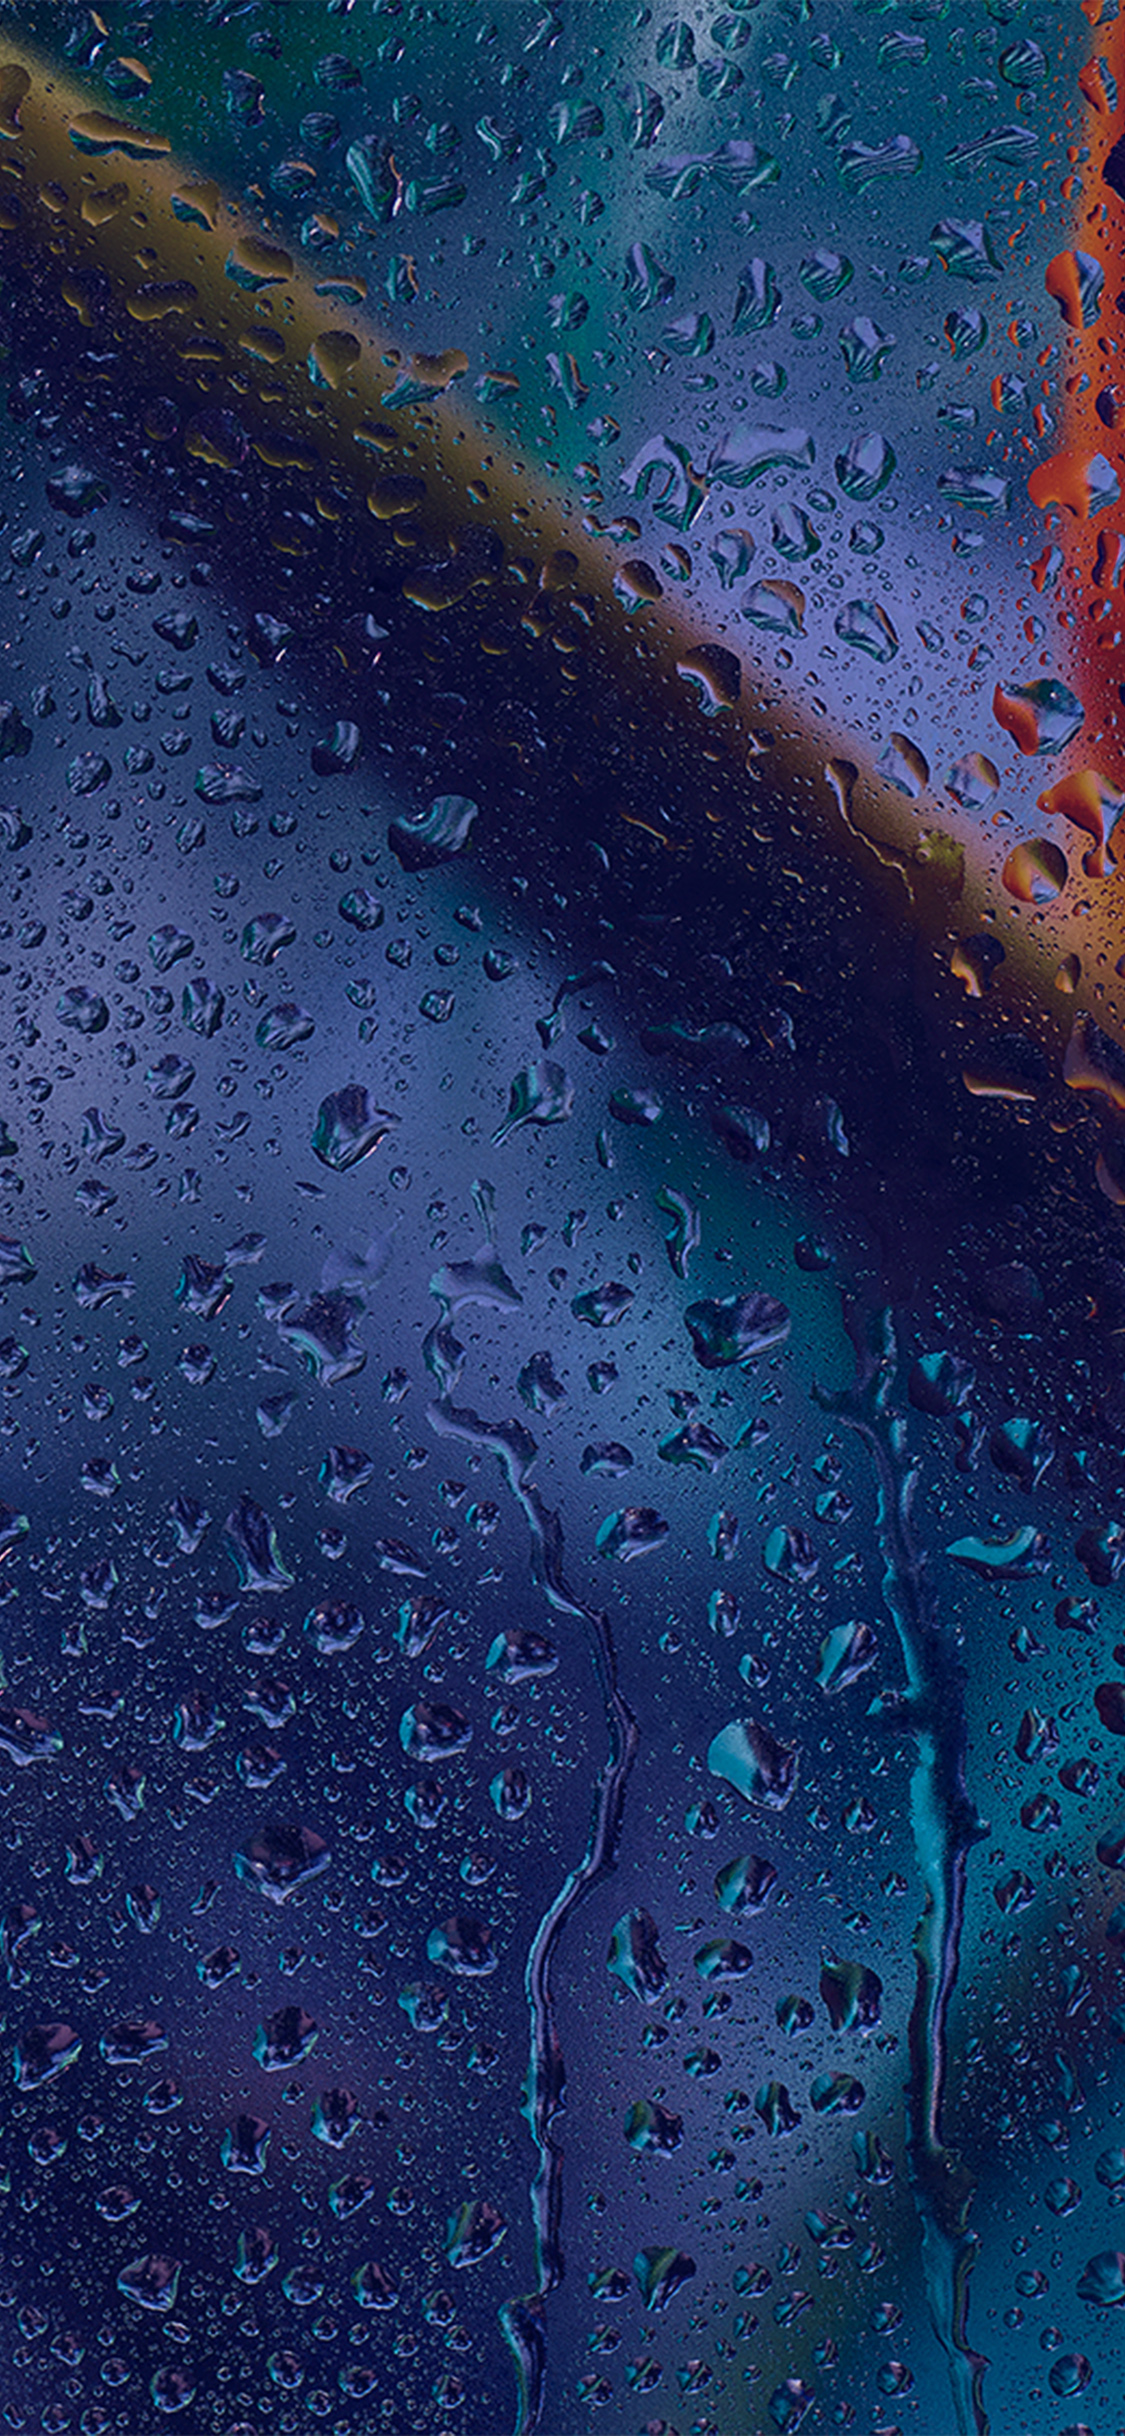 iPhonexpapers.com-Apple-iPhone-wallpaper-vx52-rain-blue-pattern-background-dark